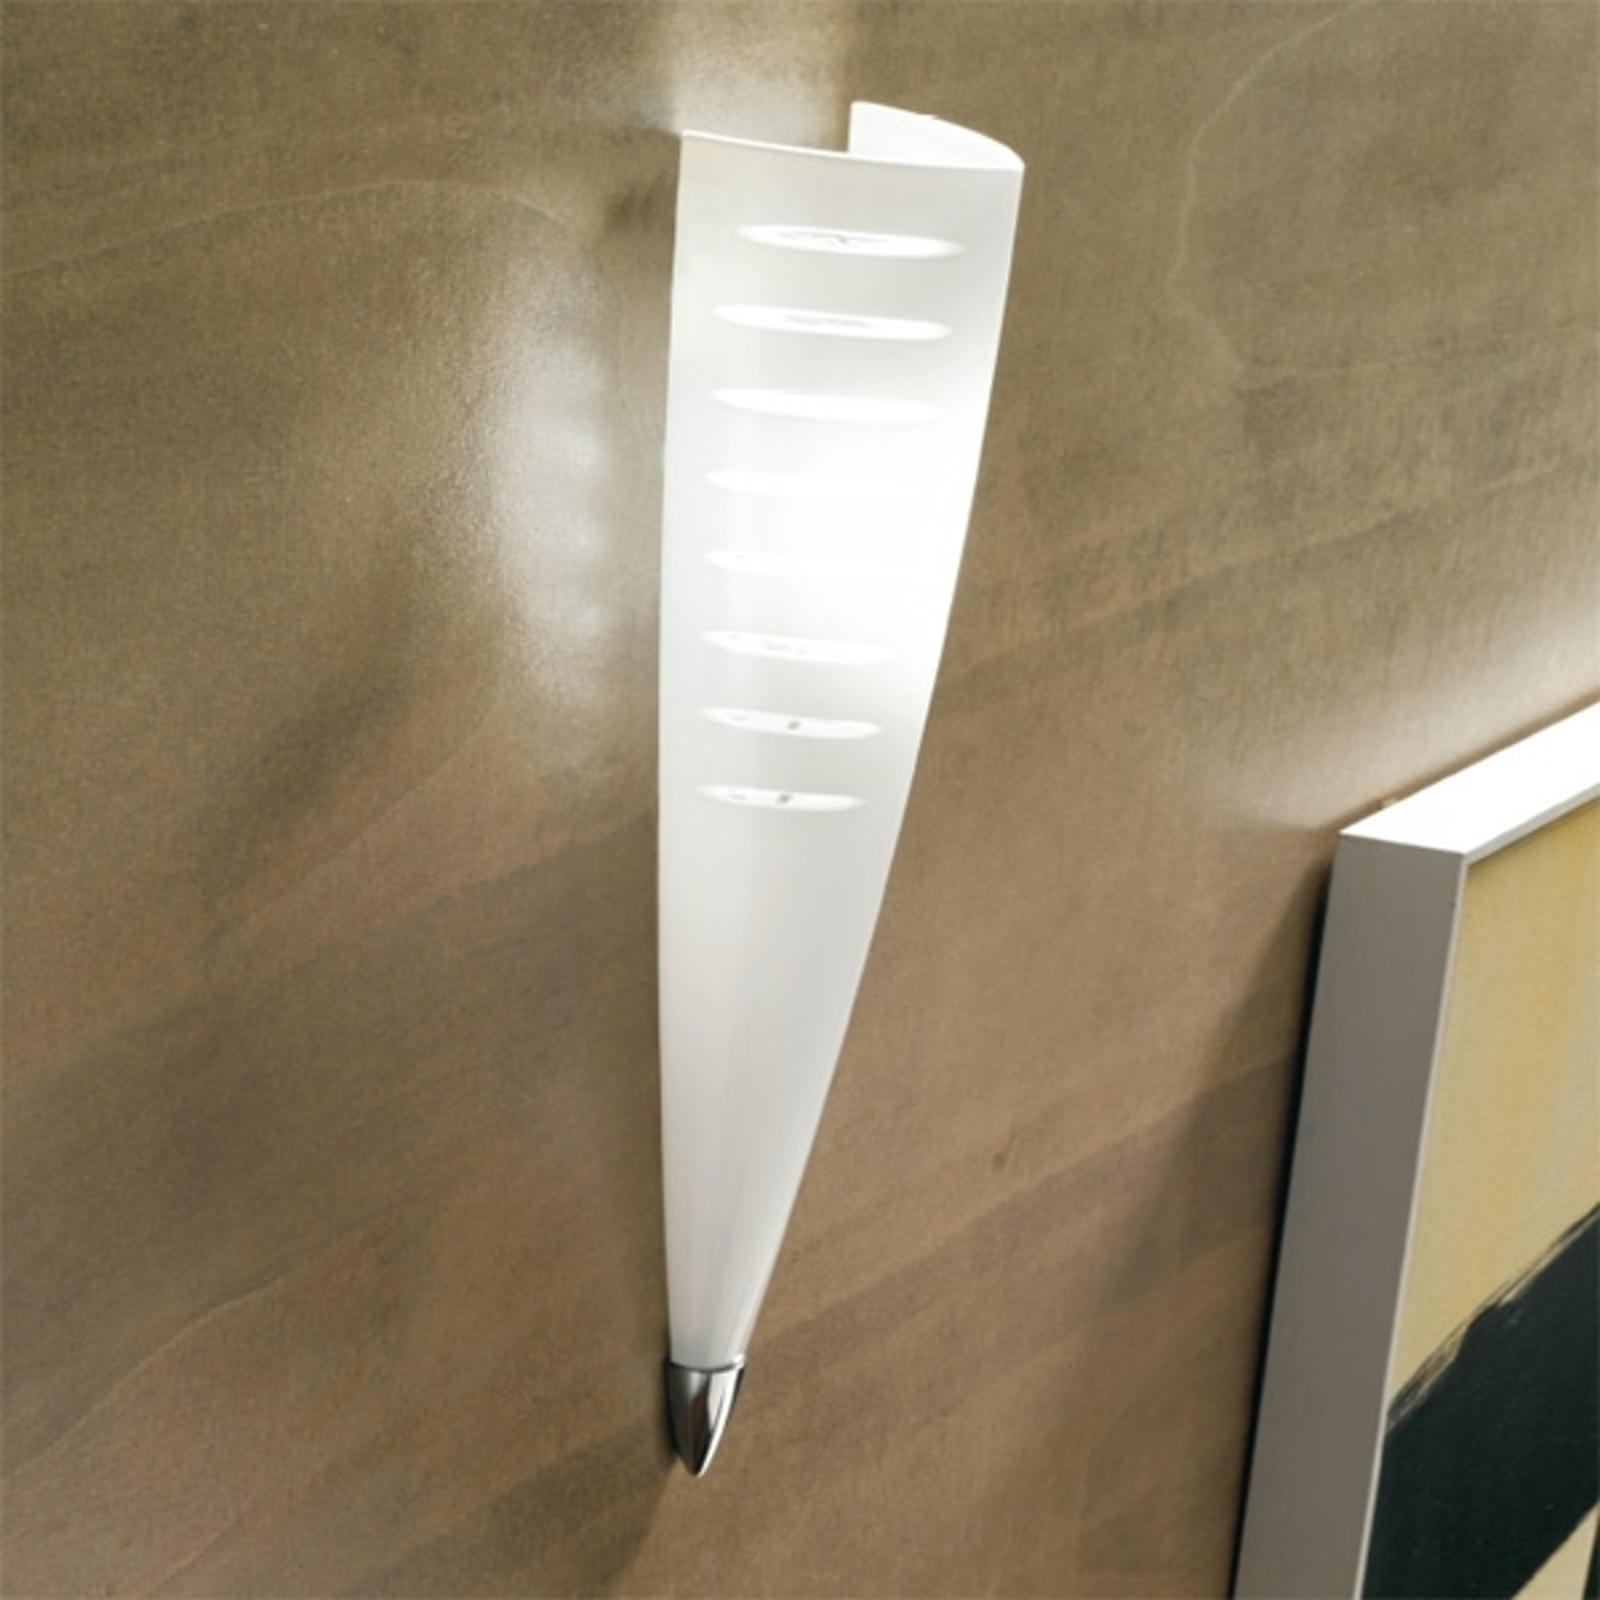 Brilliantly shaped wall light Iris_6059116_1